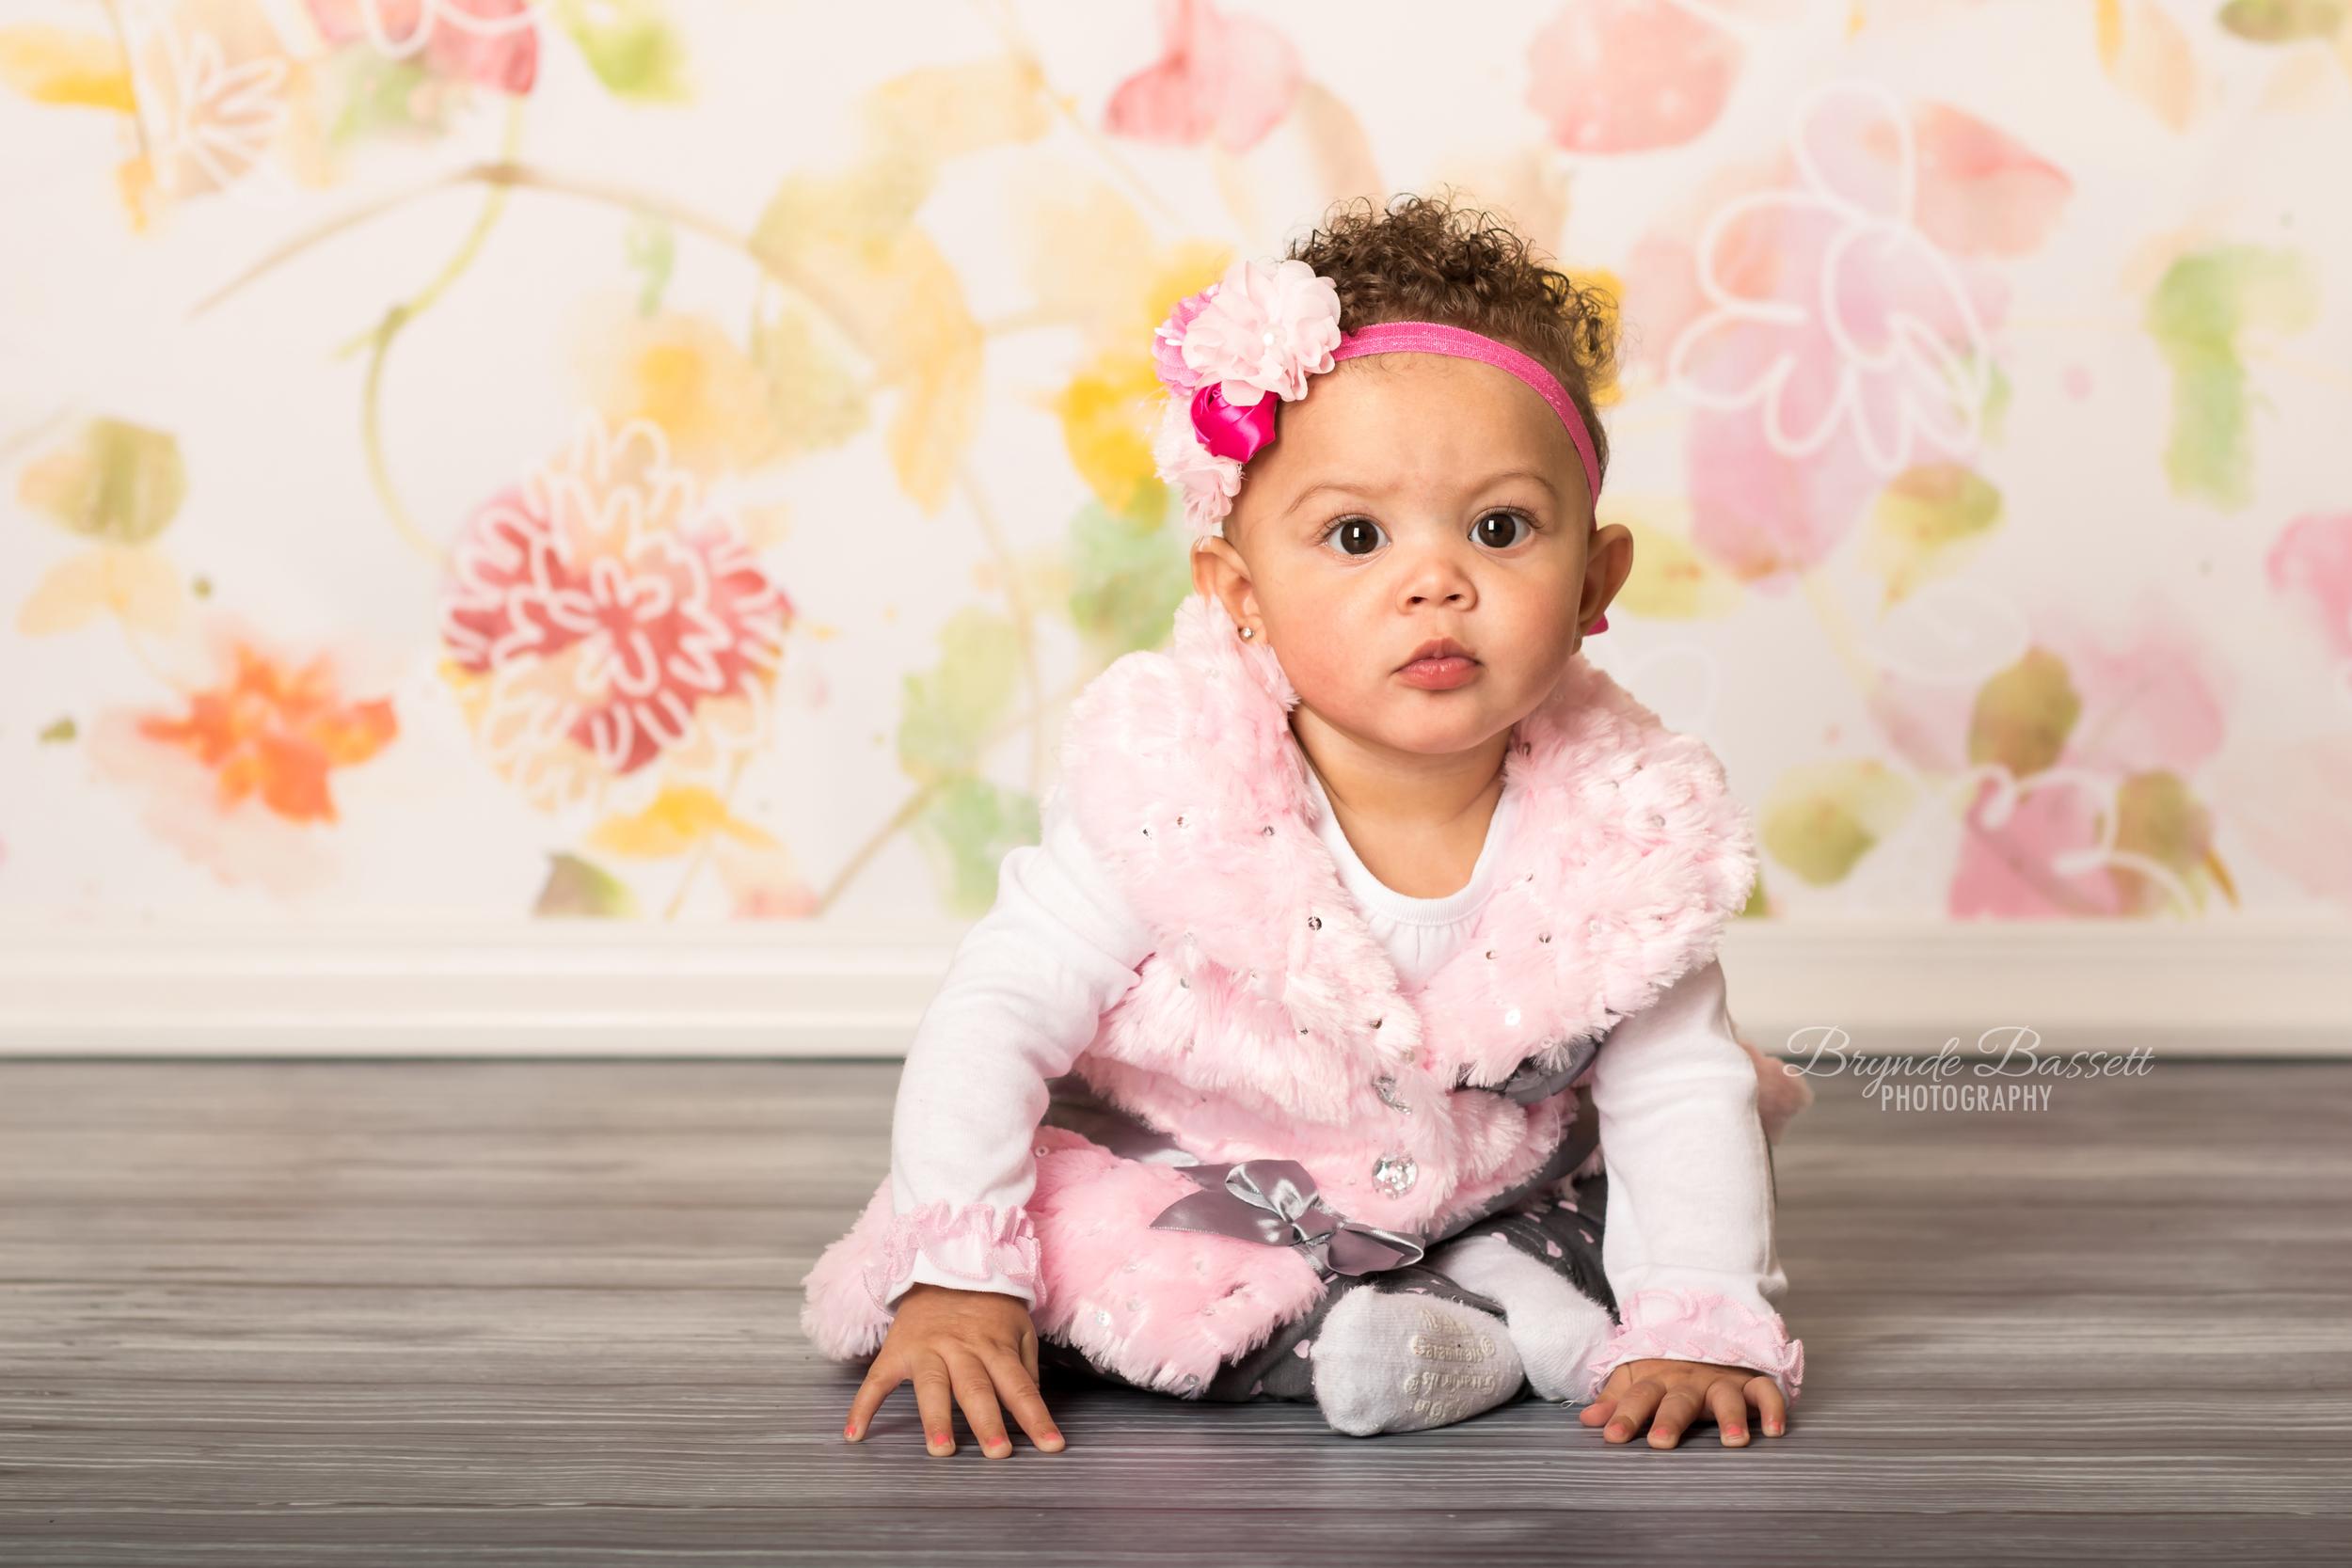 Idaho Baby Photographer - Brynde Bassett Photography.JPG